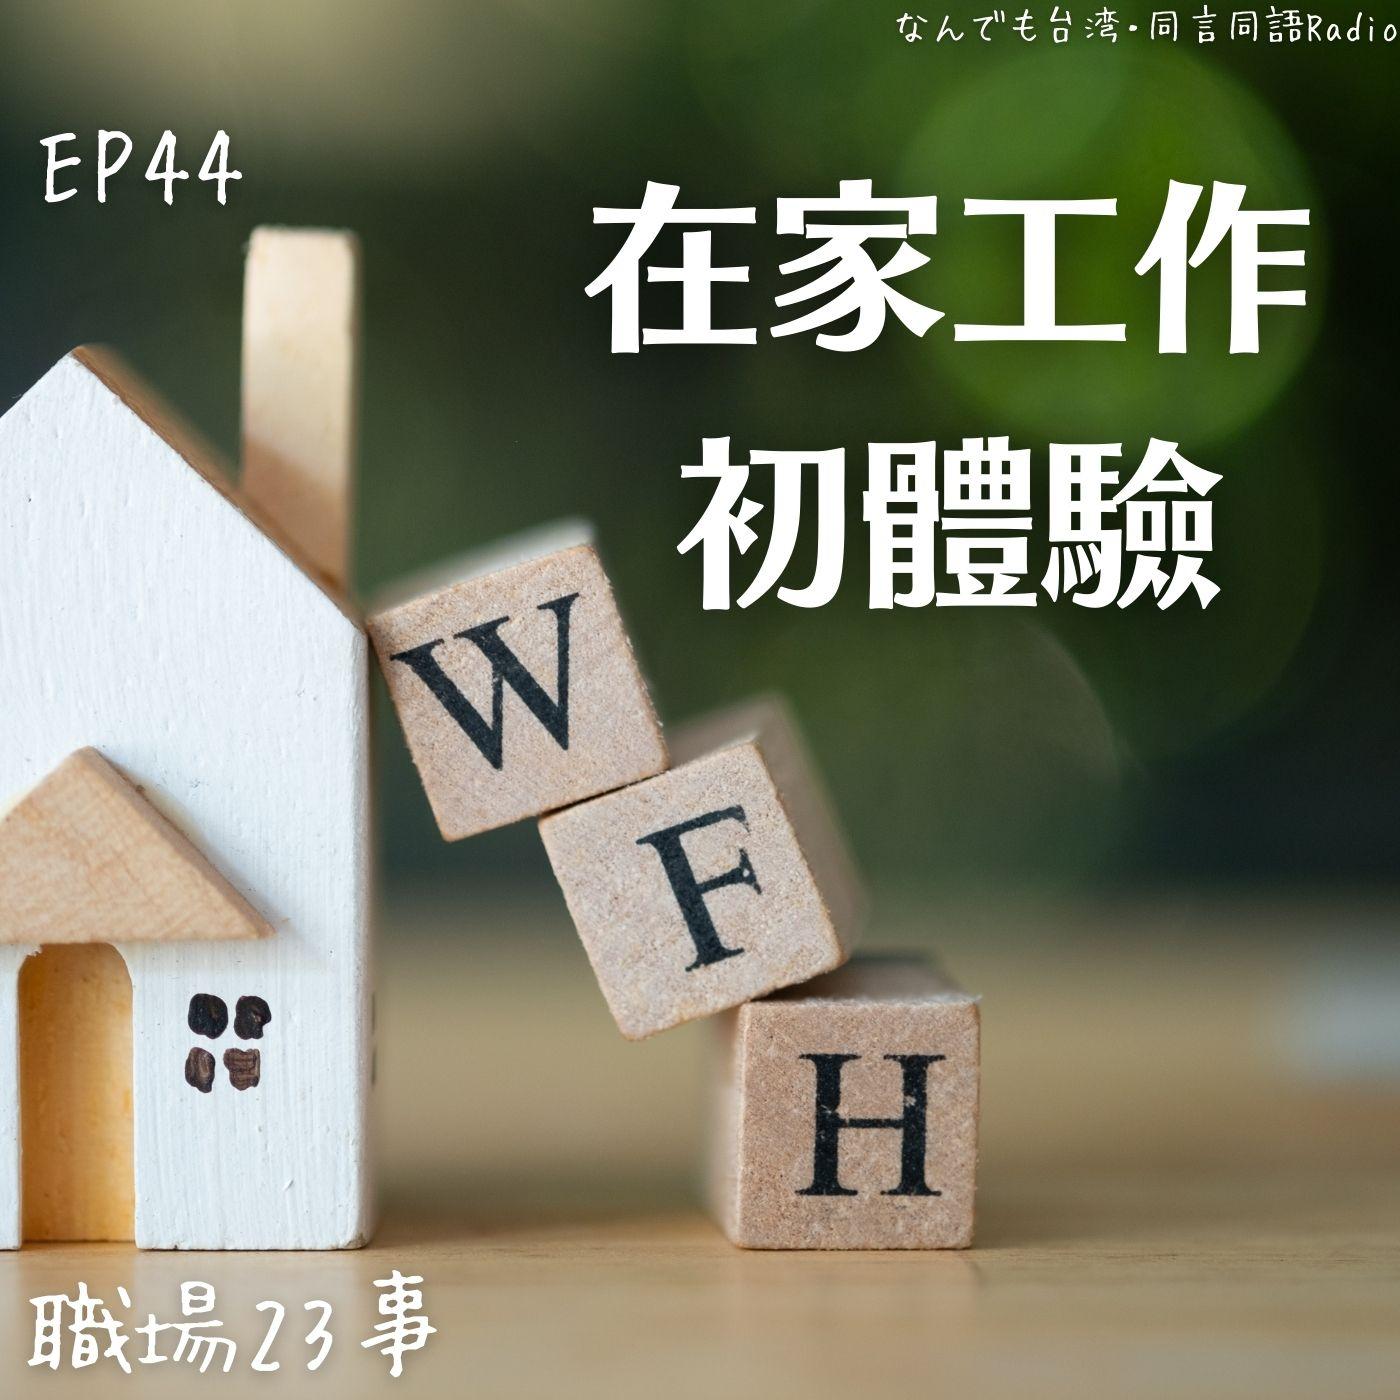 EP44 - (CH)【職場23事】在家工作初體驗